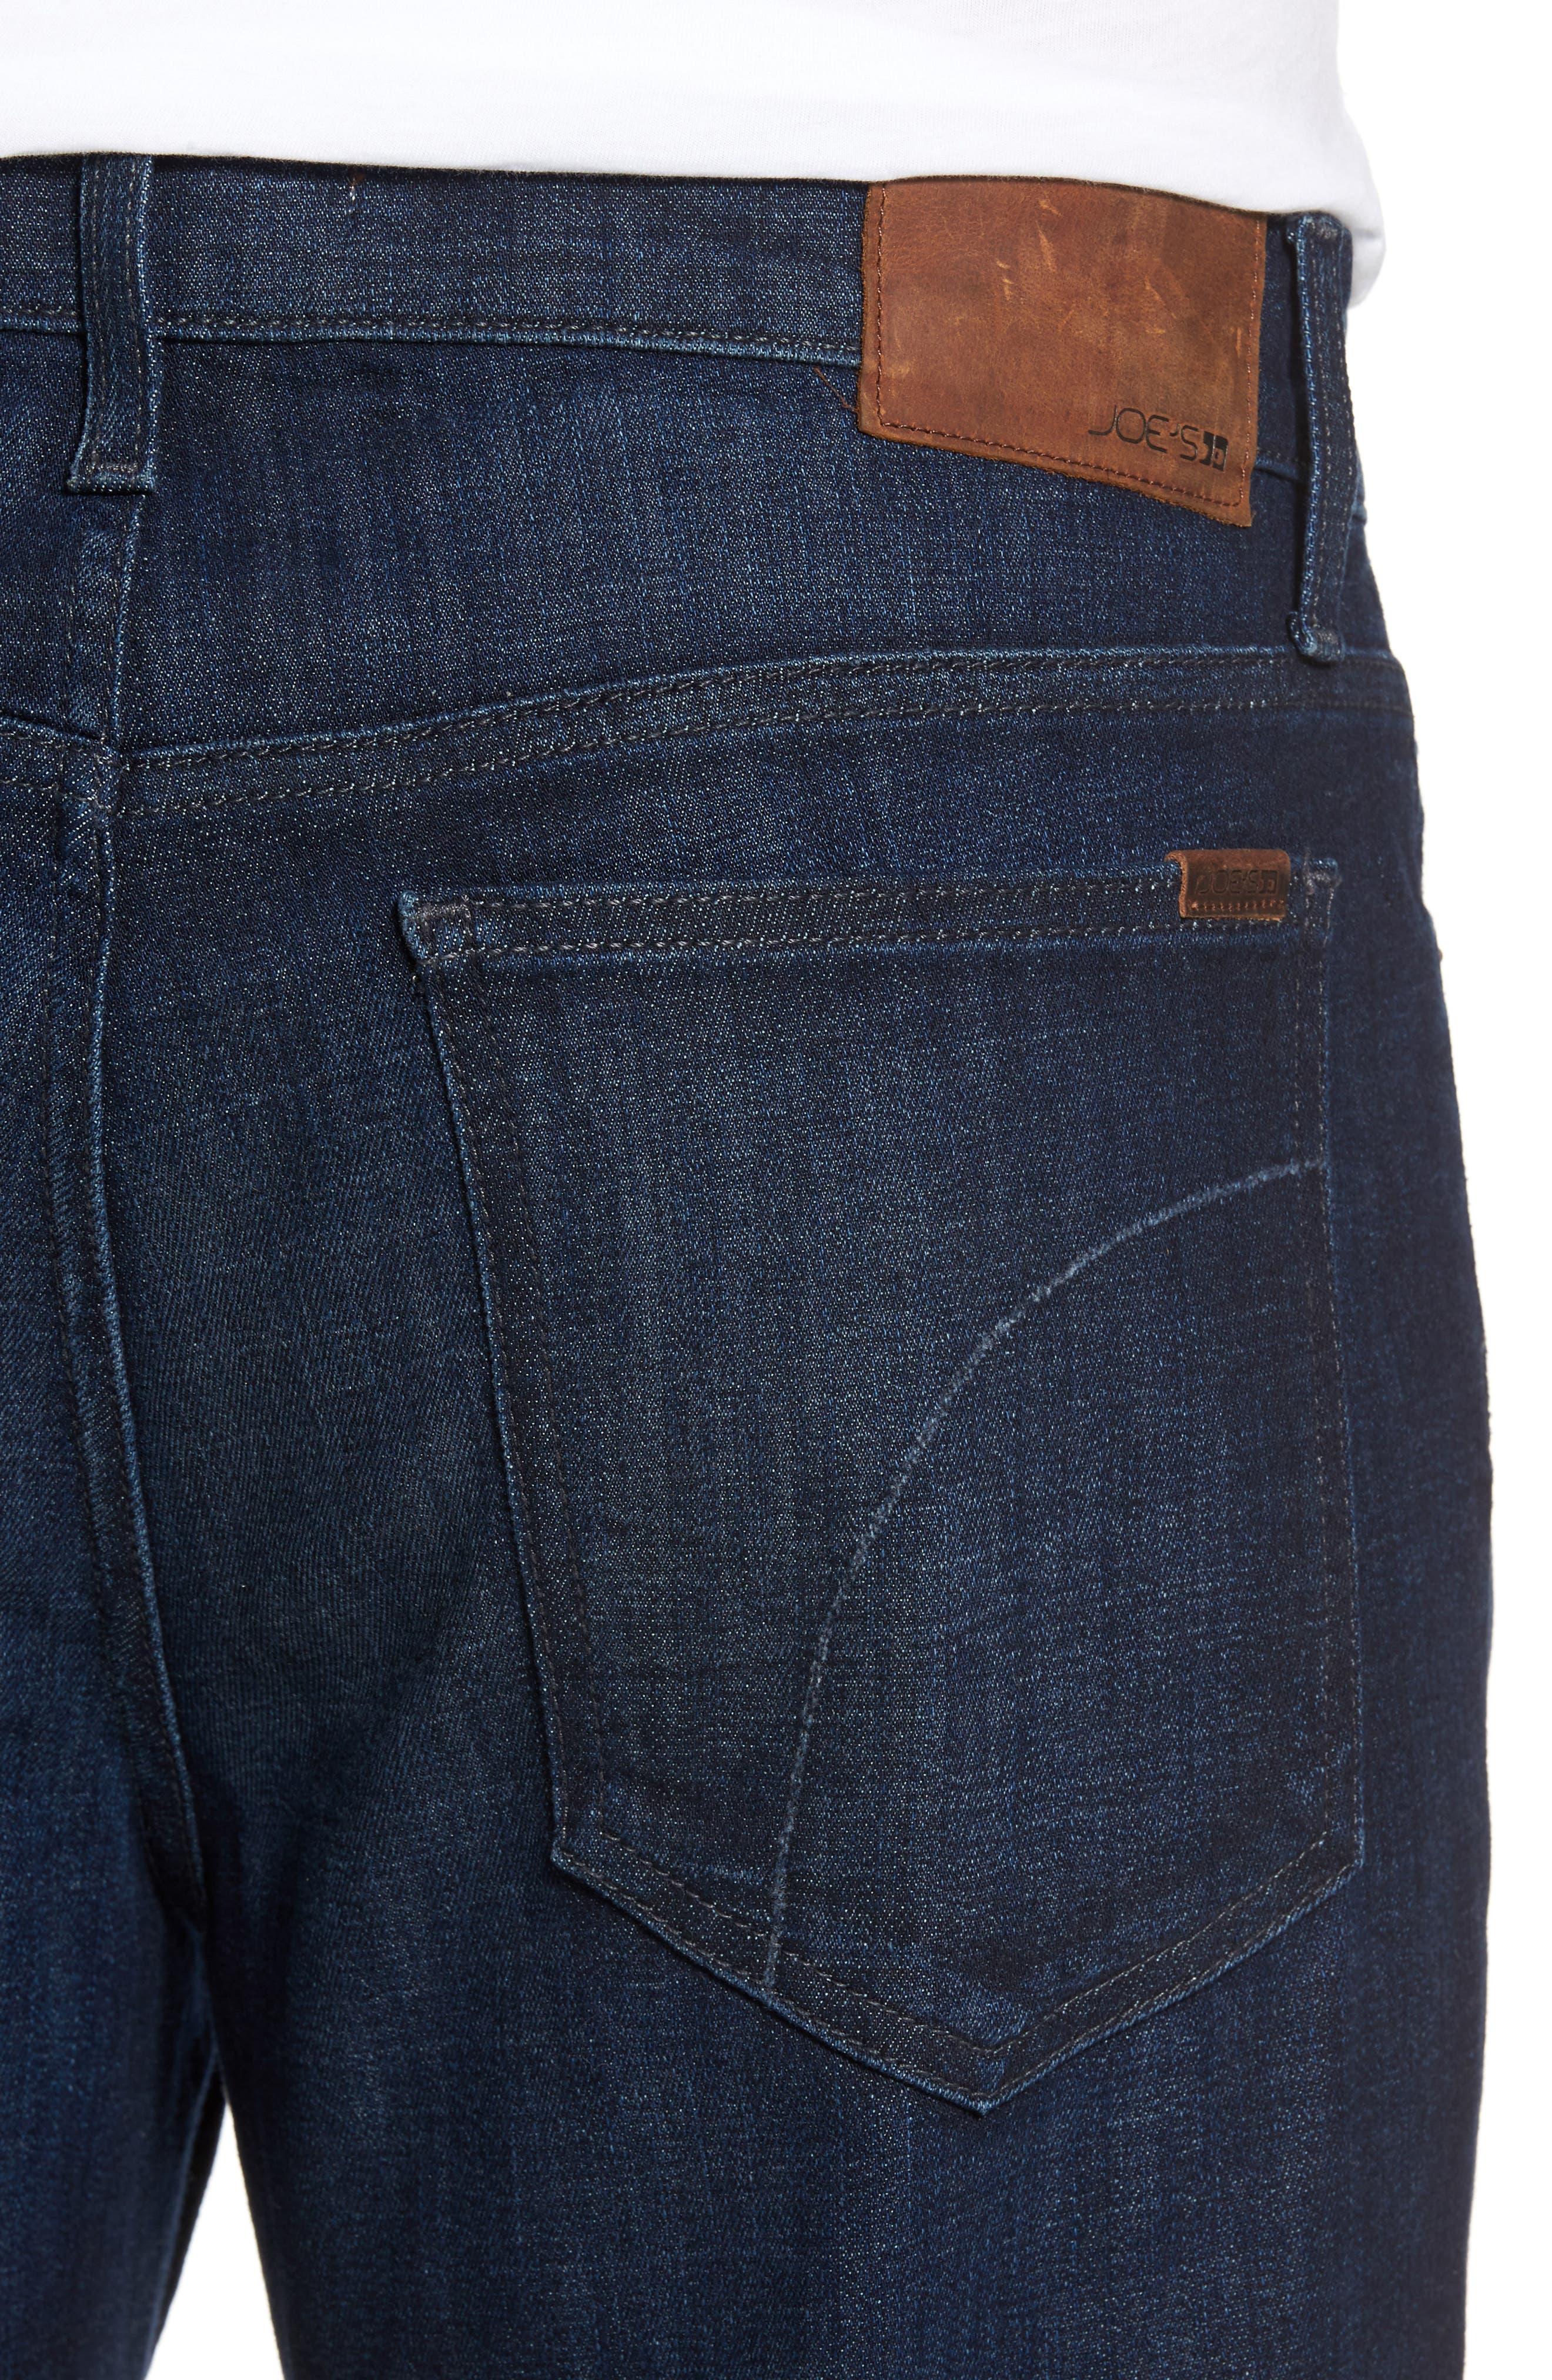 Alternate Image 4  - Joe's Rebel Relaxed Fit Jeans (Brooks)